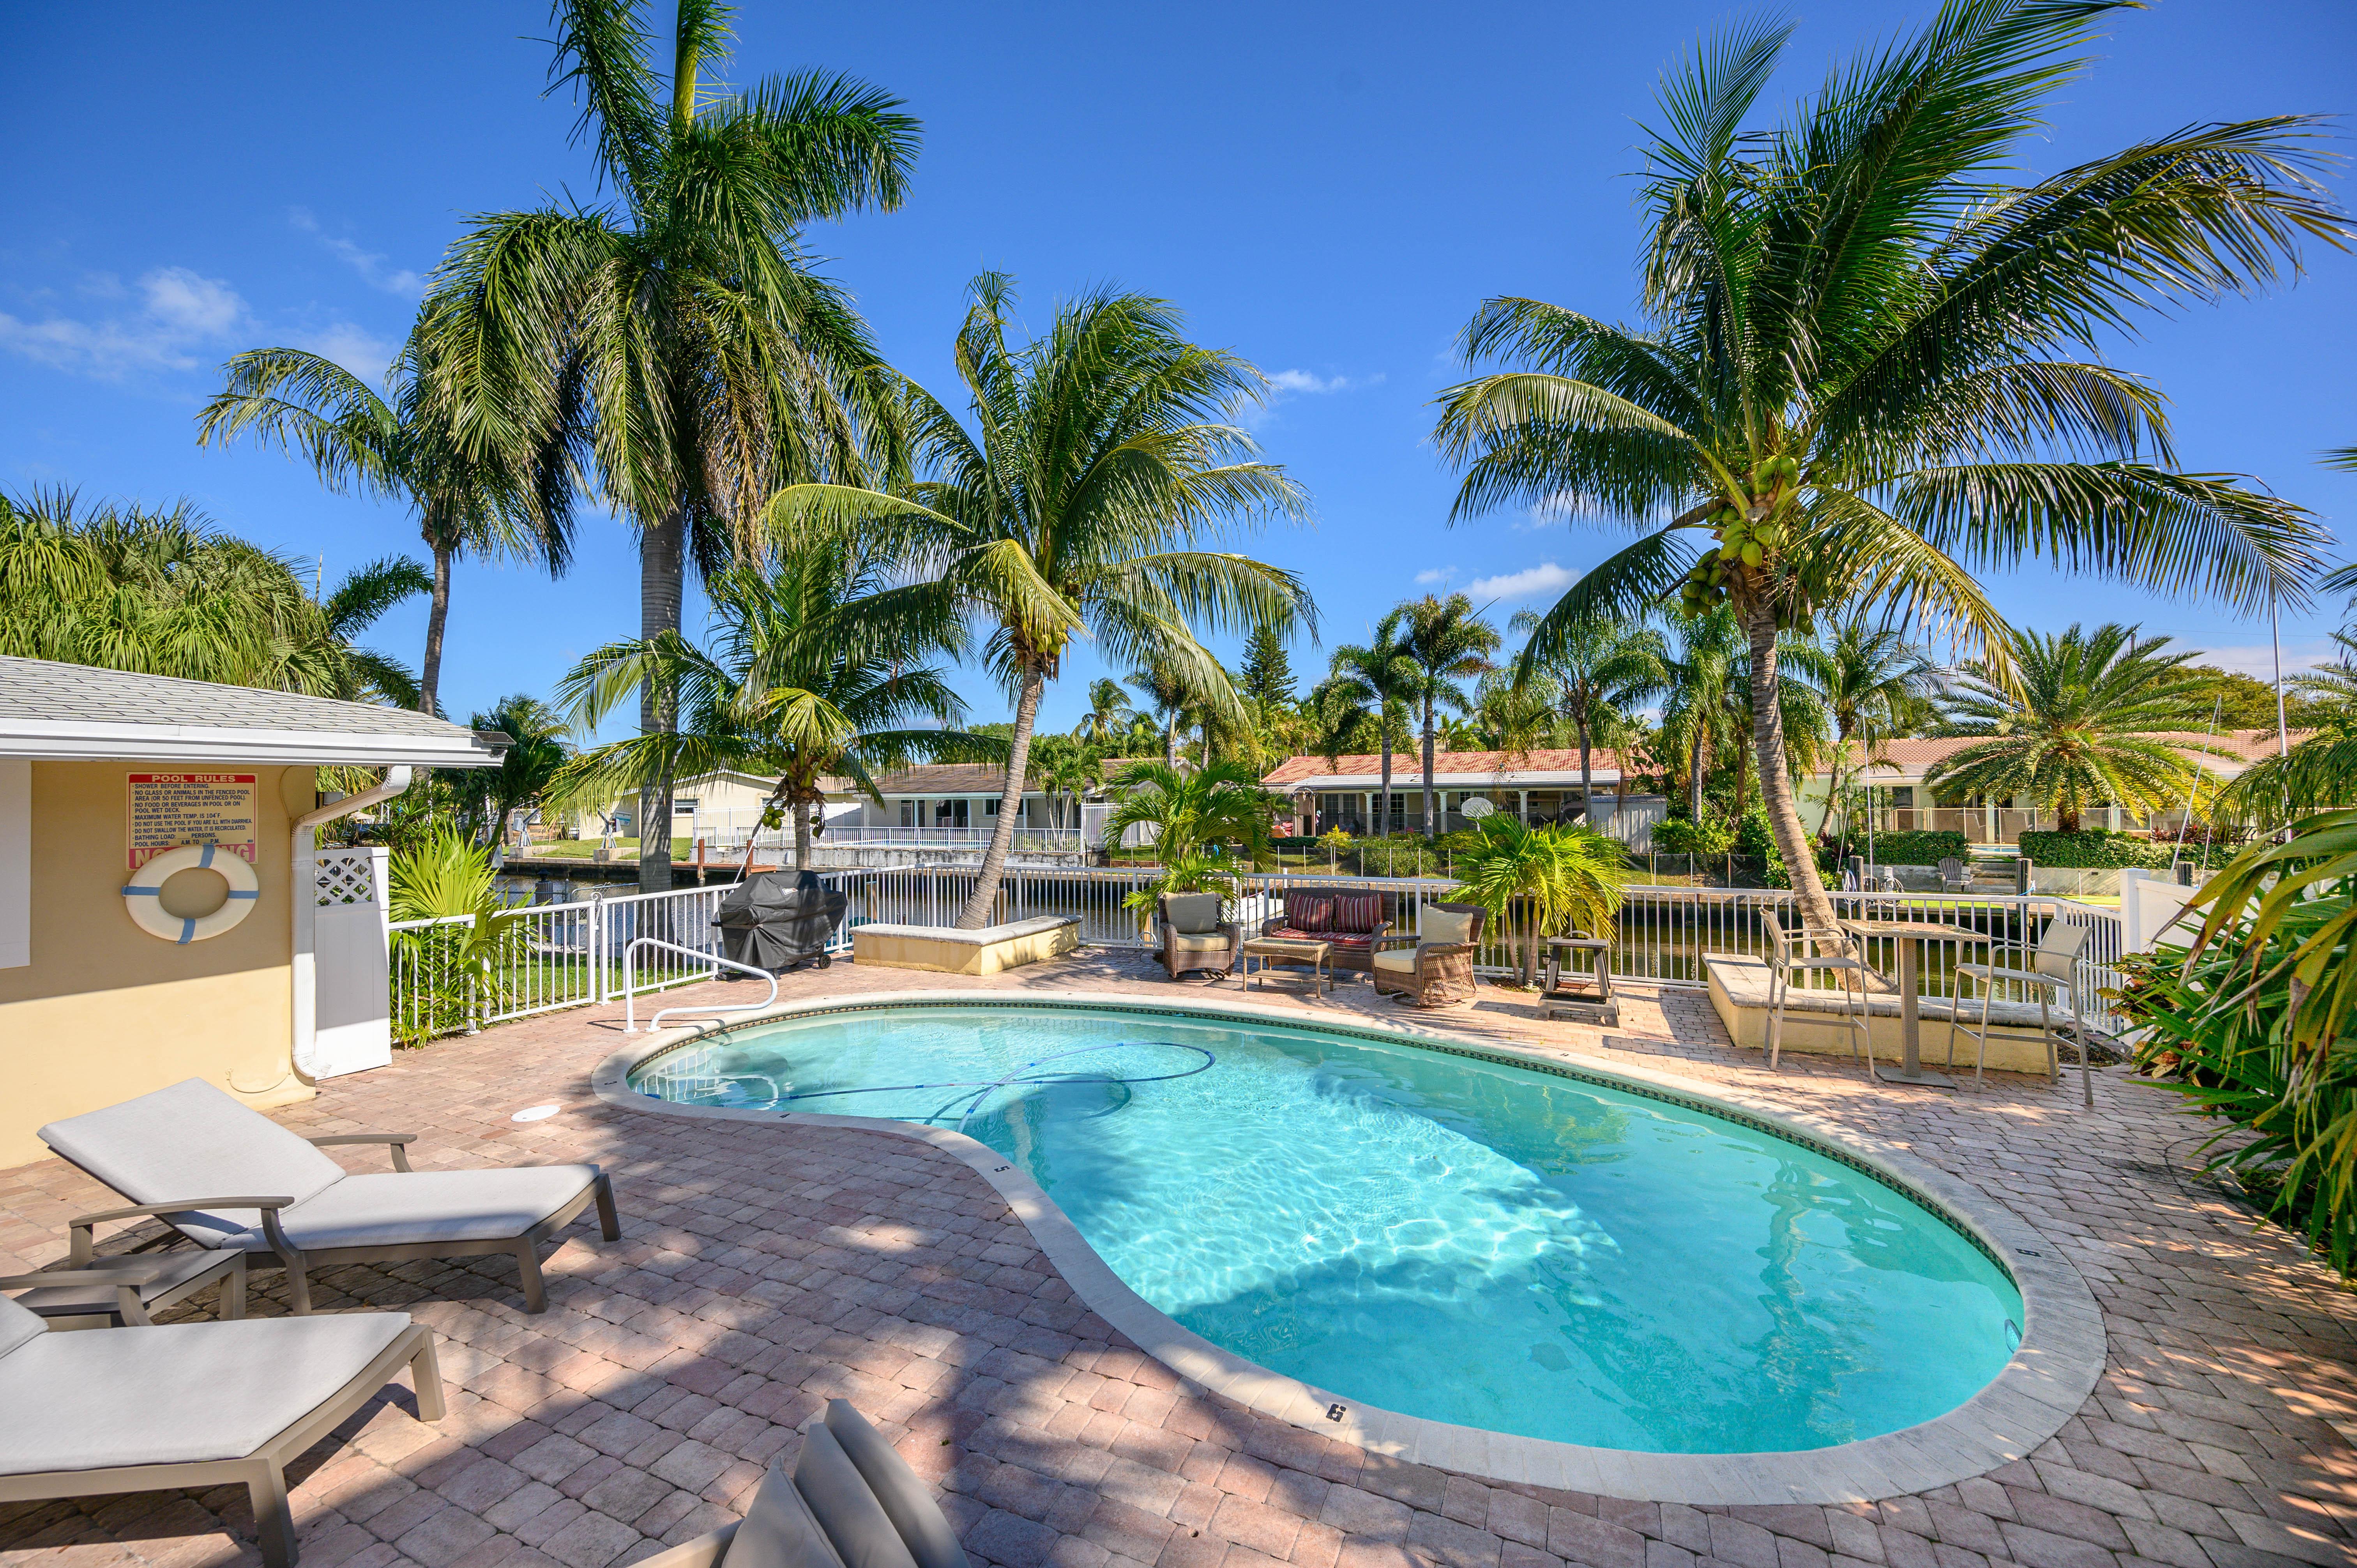 Pompano Beach FL Vacation Rental Welcome to Pompano